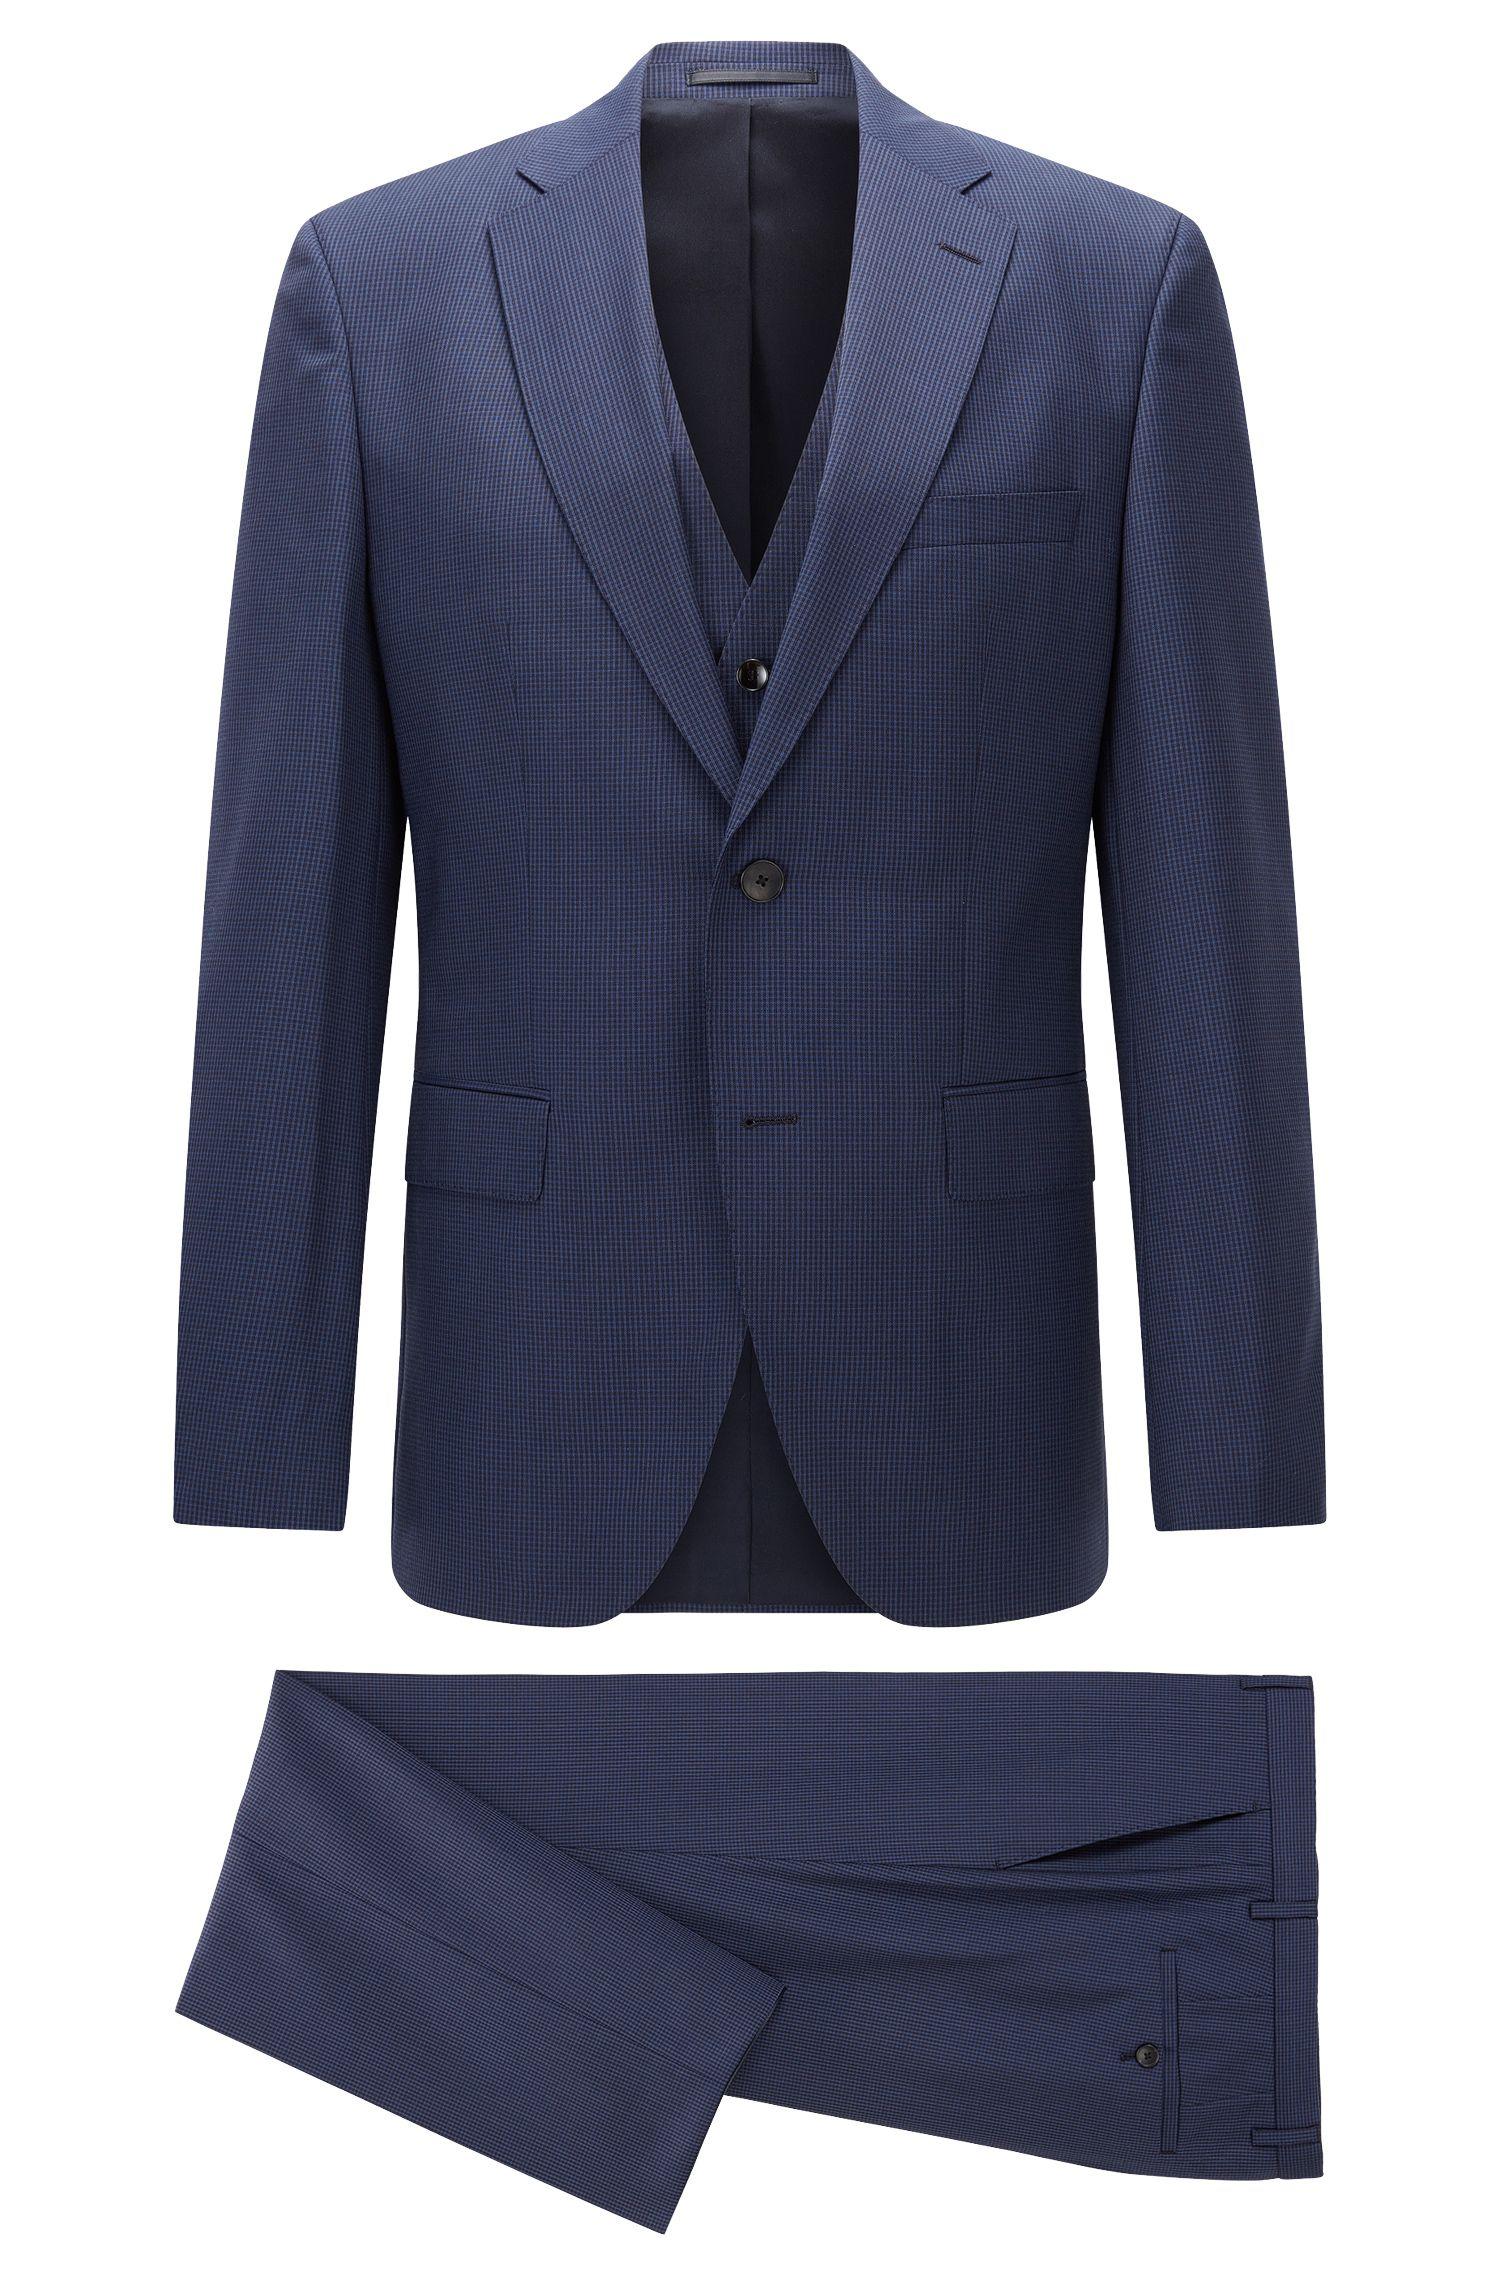 Microcheck Virgin Wool 3-Piece Suit, Regular Fit | Jerron/Lenon WE